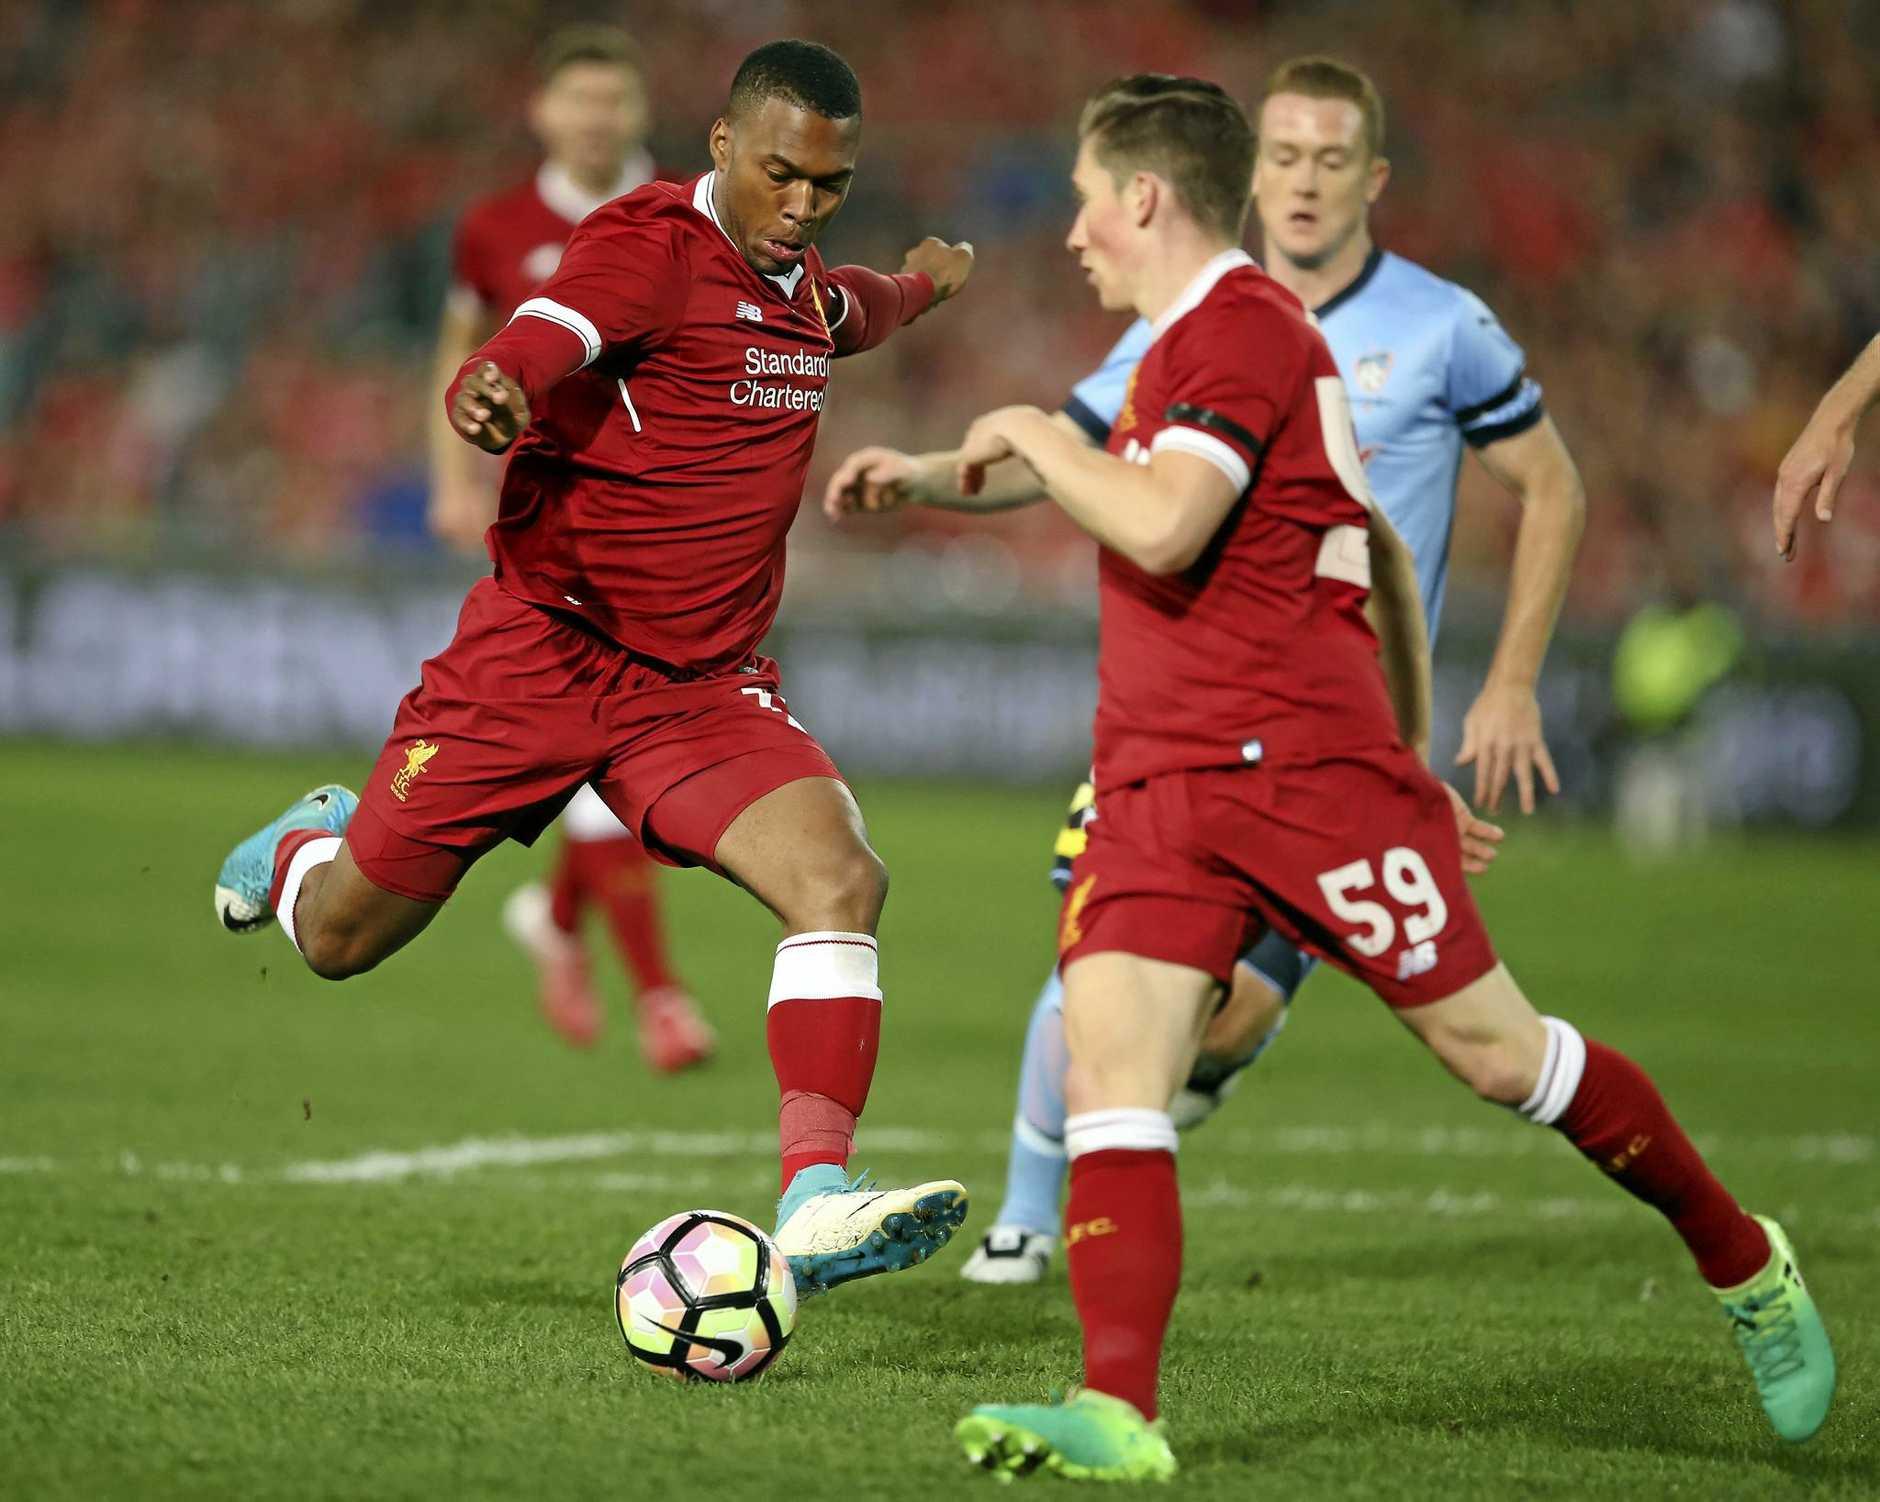 Liverpool FC's Daniel Sturridge takes a shot on goal to score against Sydney FC.